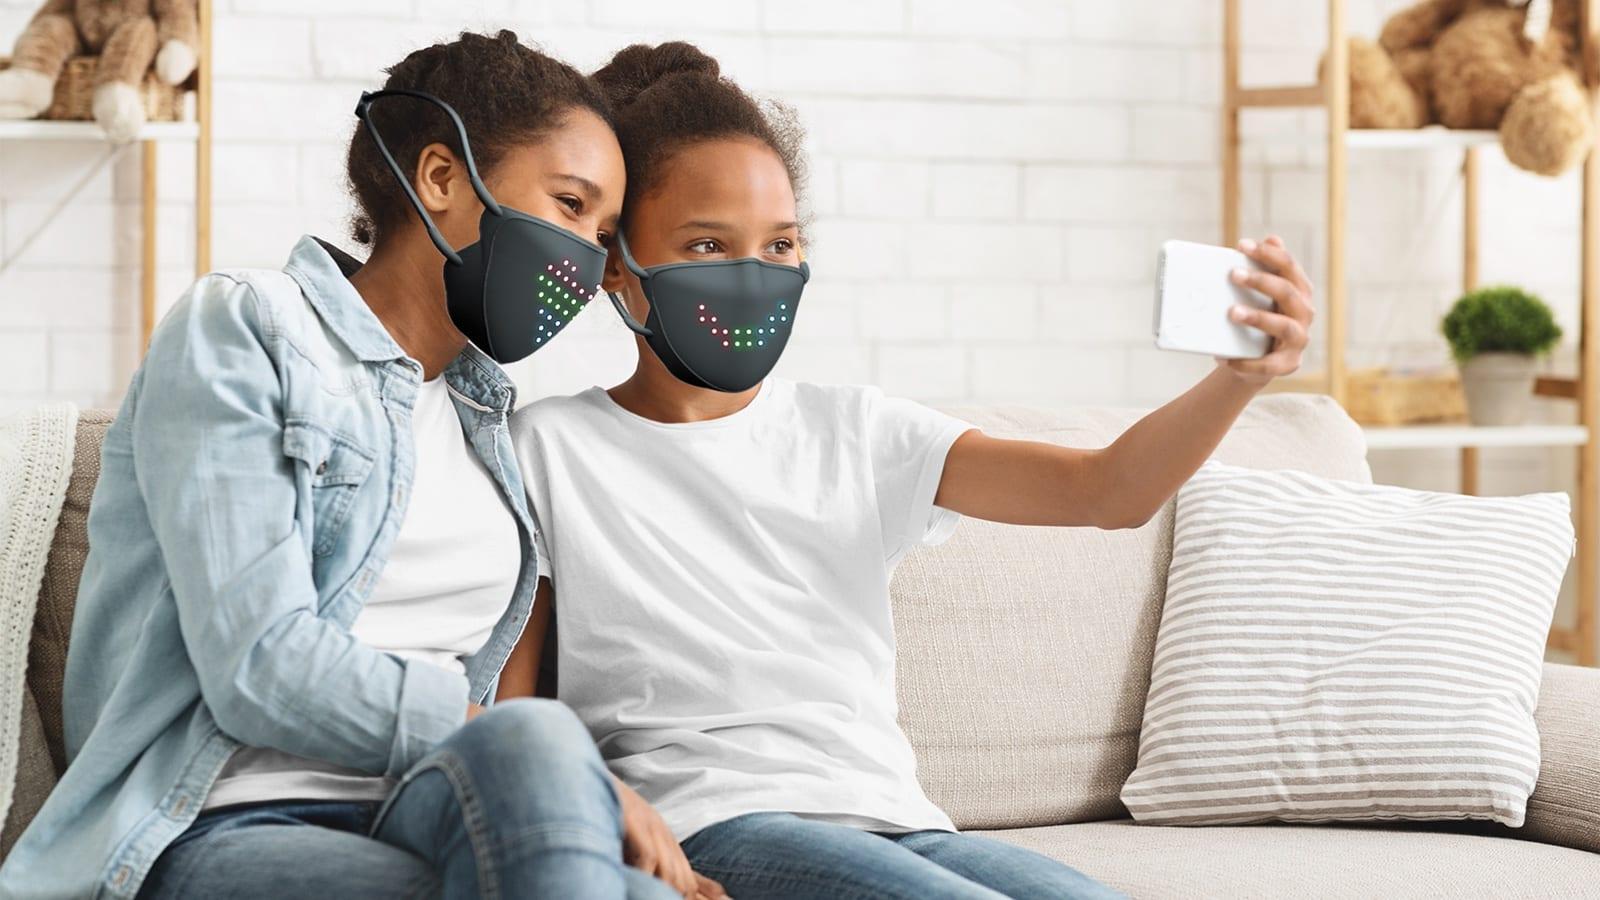 JabberMask customizable LED face mask has more than 50 unique options